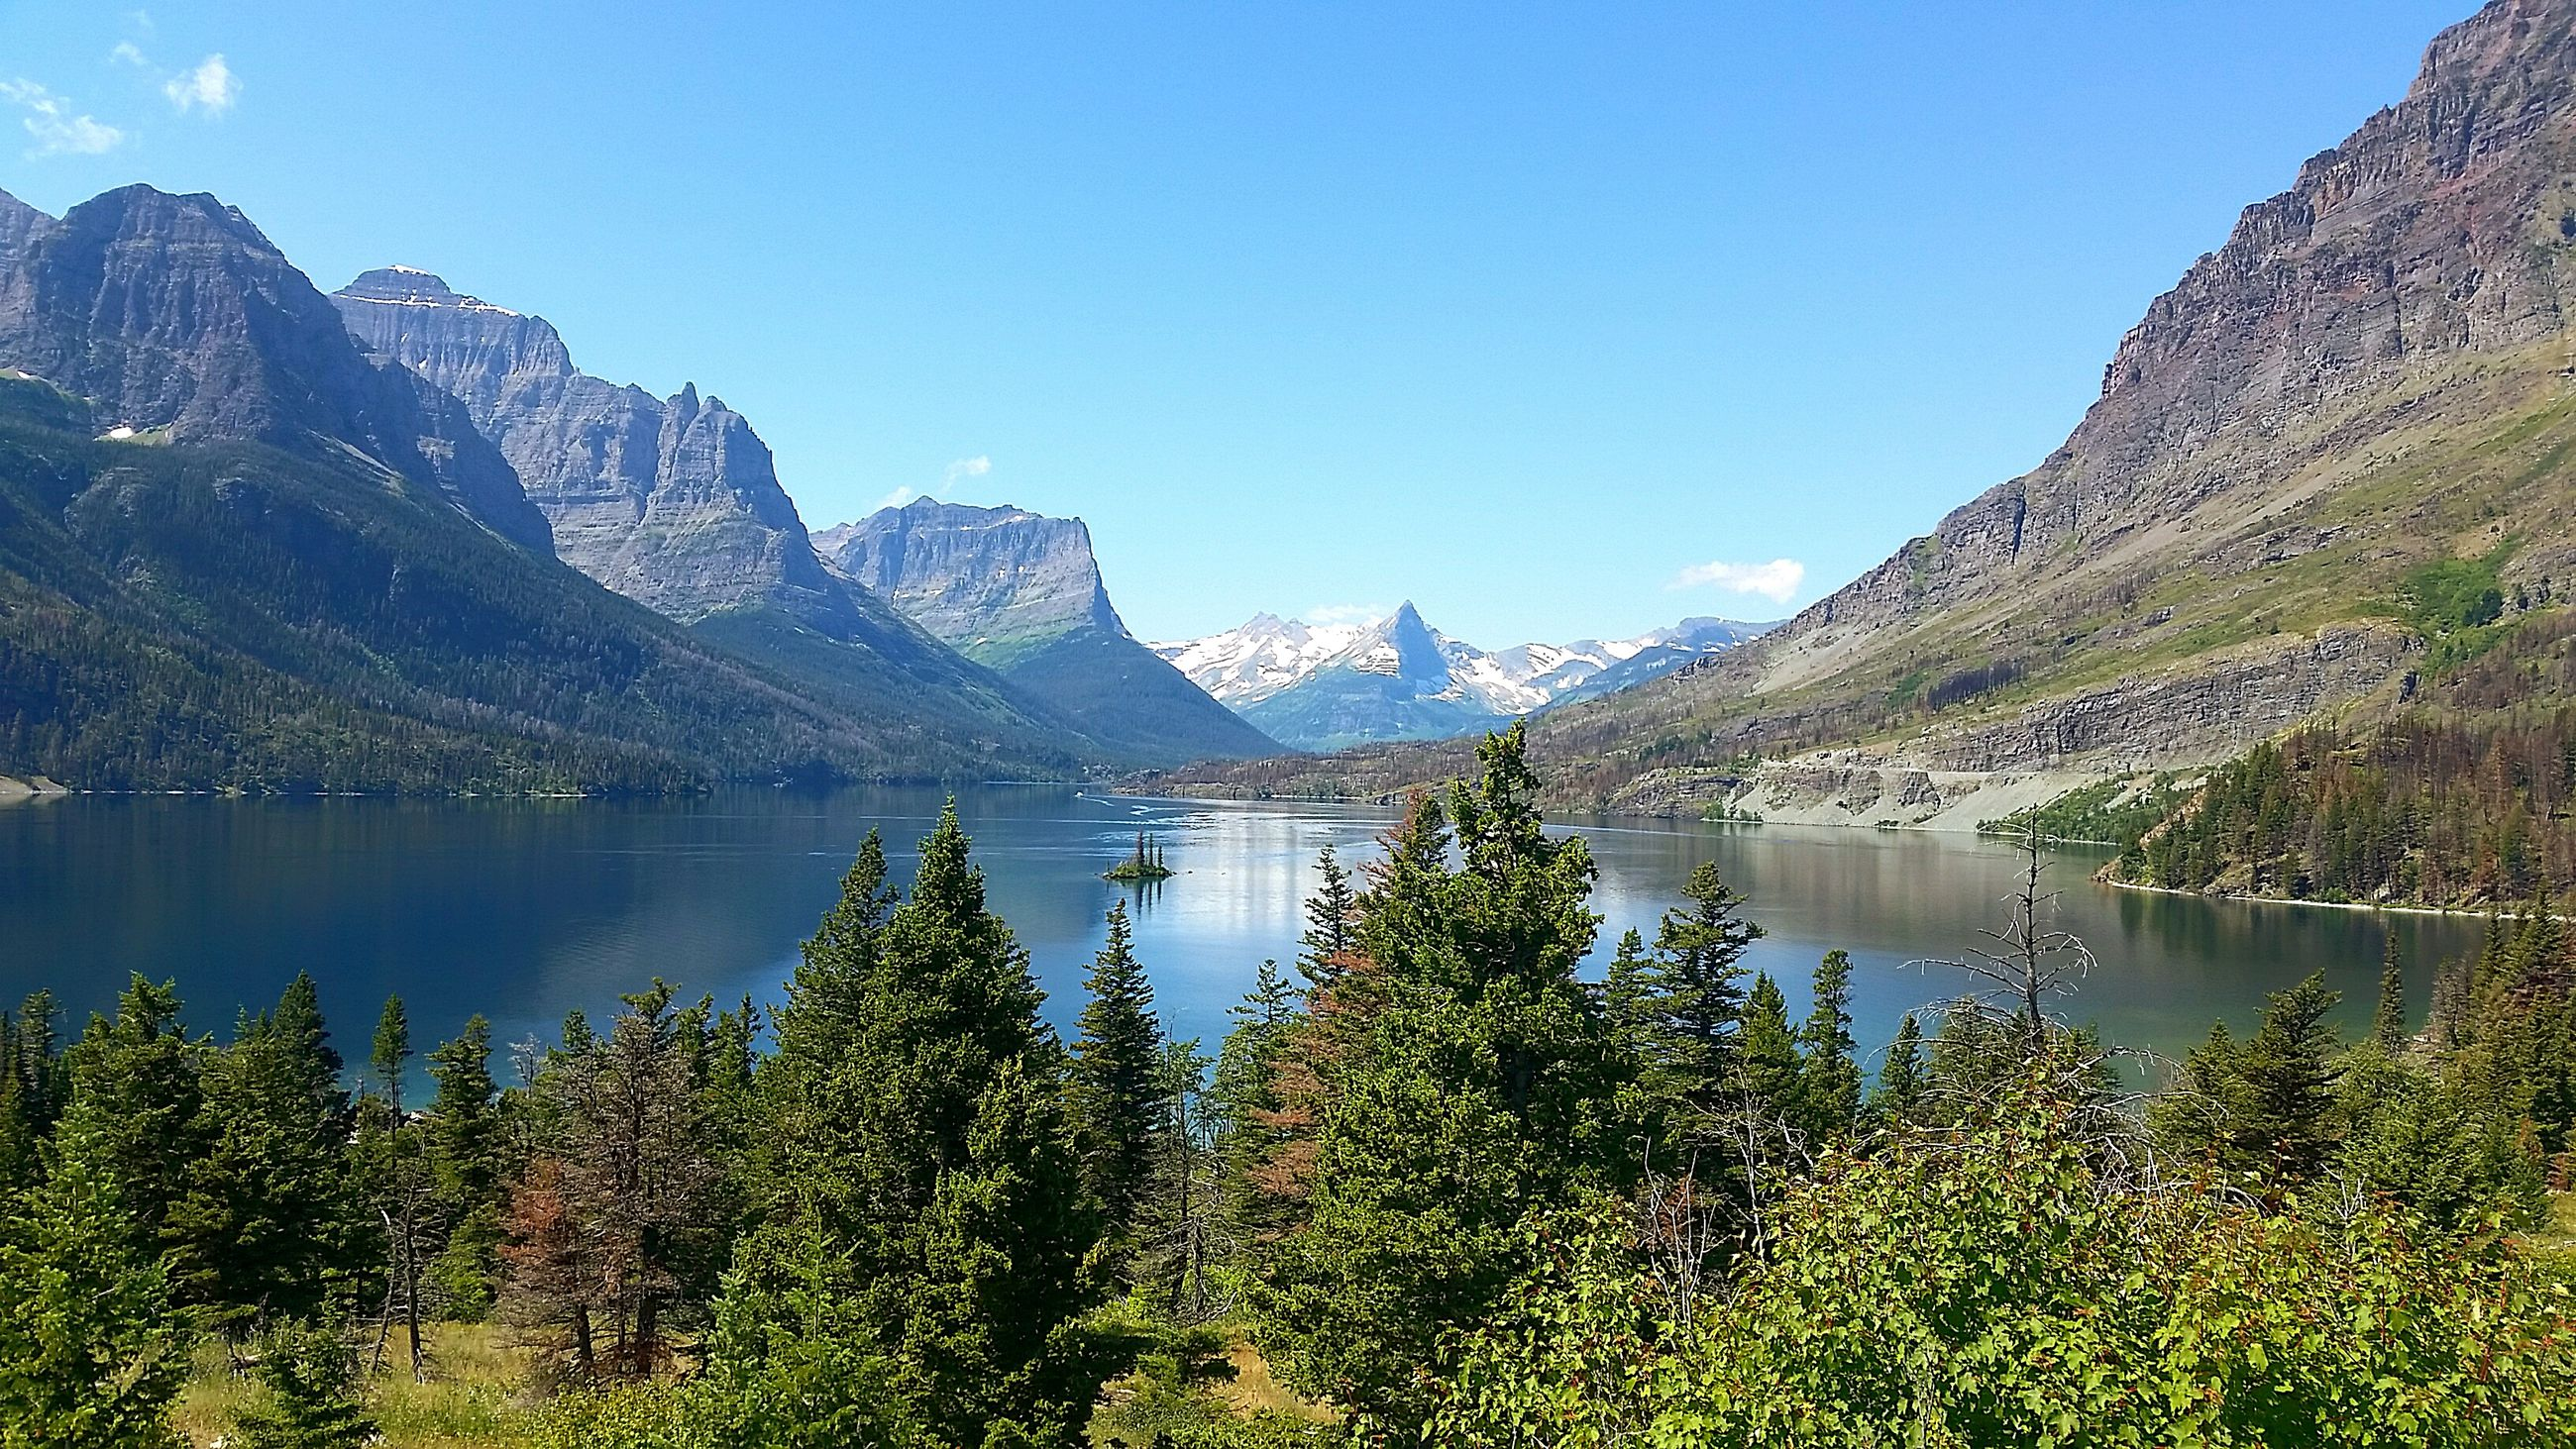 mountain, water, tranquil scene, lake, tranquility, beauty in nature, scenics, blue, mountain range, nature, tree, sky, idyllic, plant, growth, landscape, non-urban scene, day, season, outdoors, no people, majestic, remote, non urban scene, calm, tourism